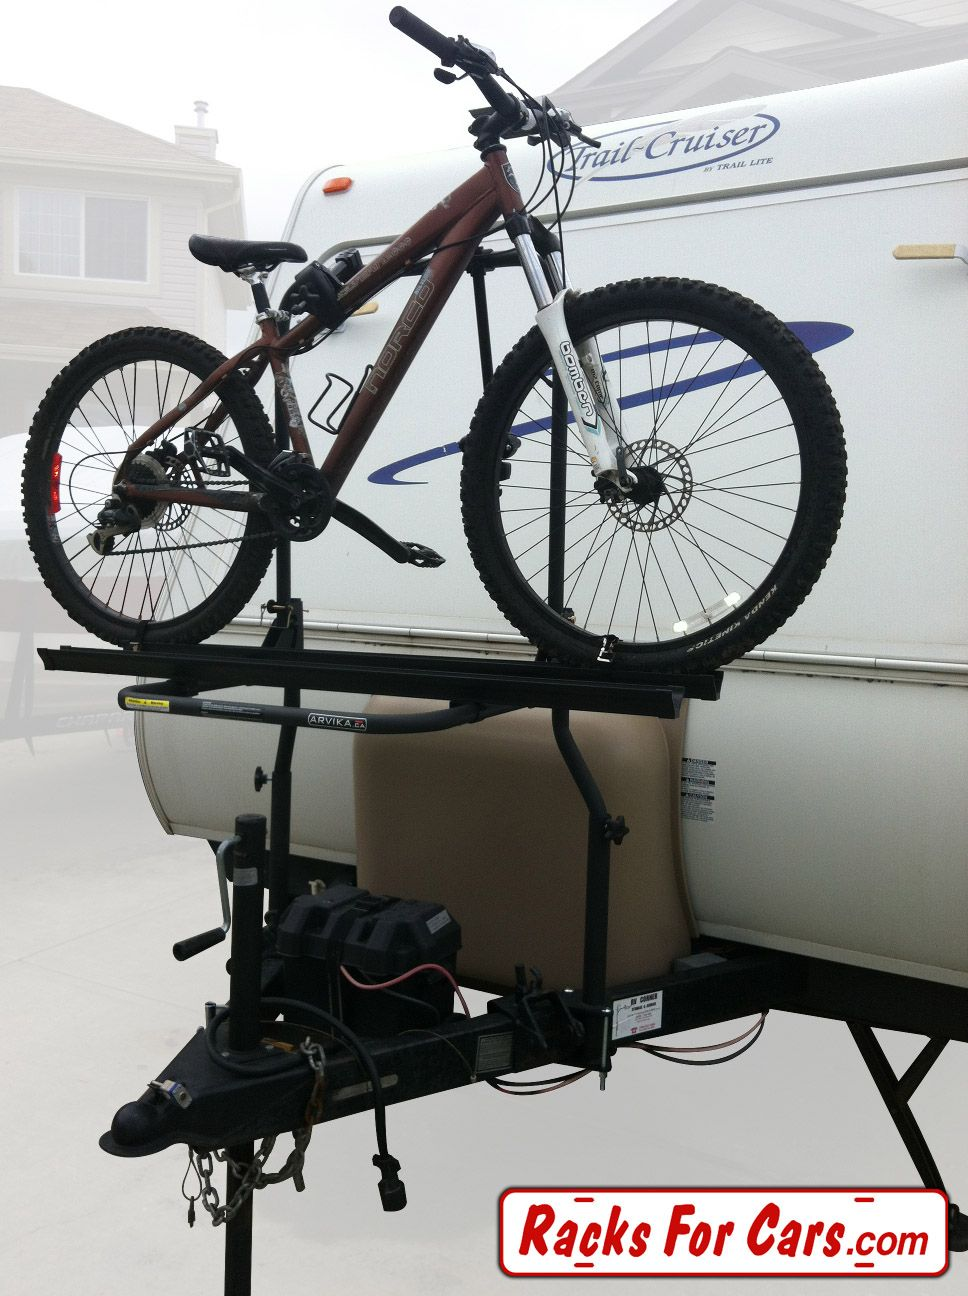 Arvika 2 bike rack with travel trailer bracket holding a